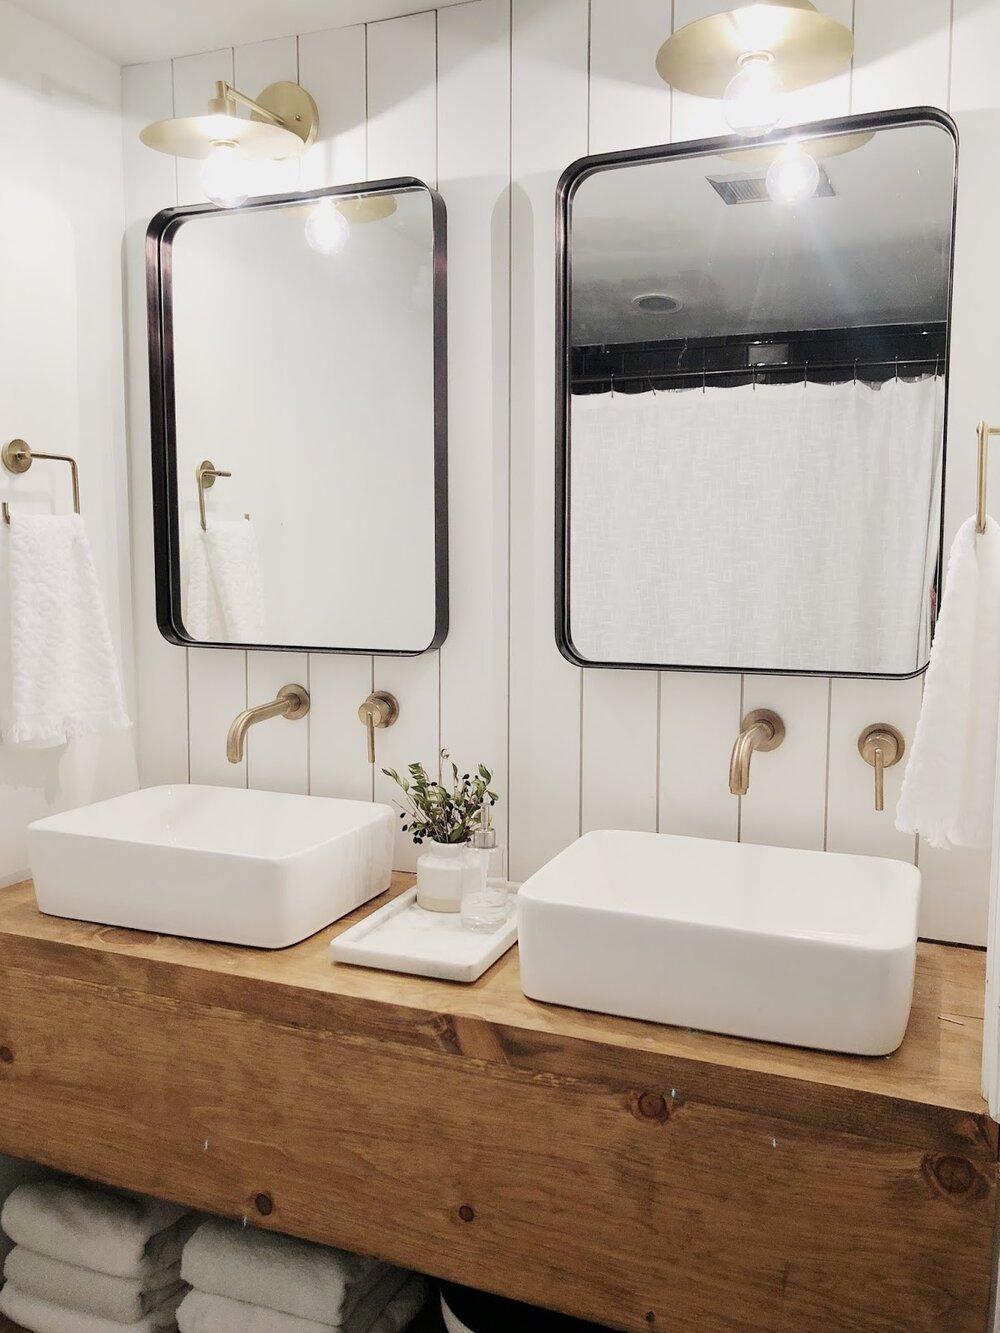 Delta Bathroom Remodel House Seven